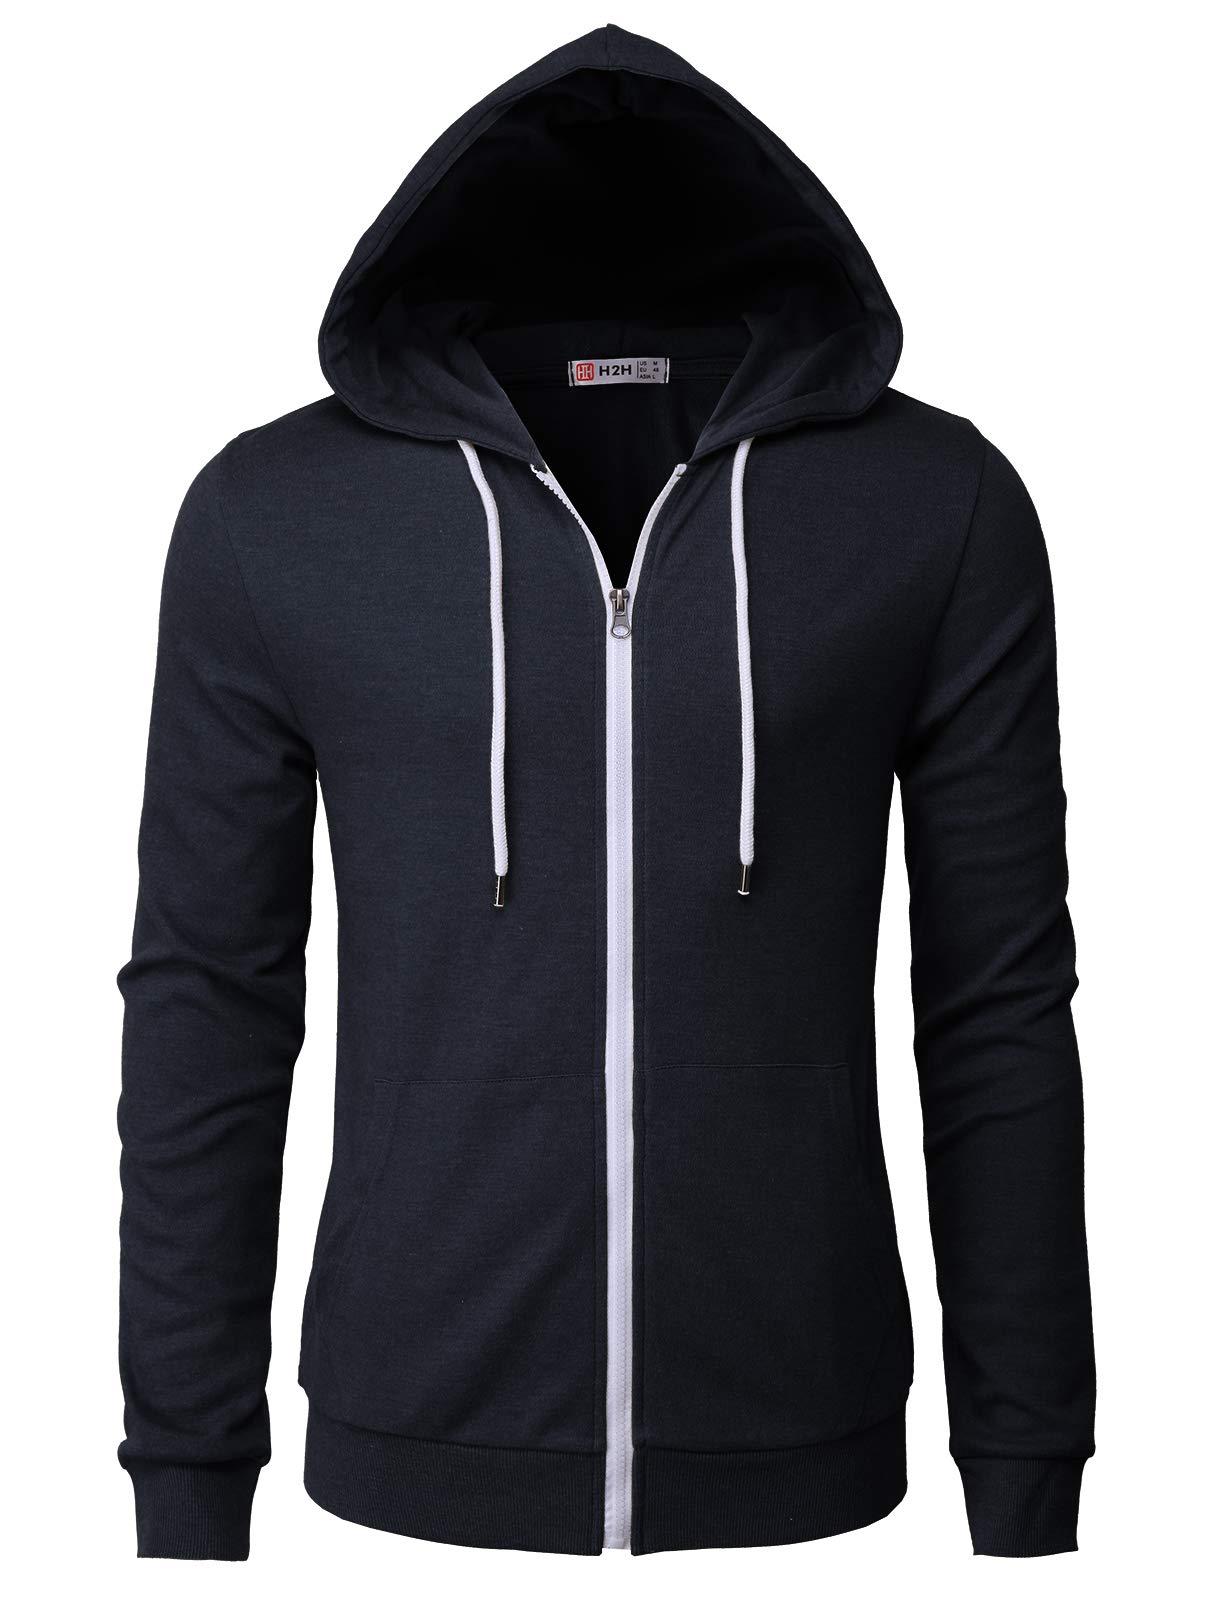 H2H Mens Casual Long Sleeve Zip up Hoodie Jacket Navy US 3XL/Asia 4XL (CMOHOL048)